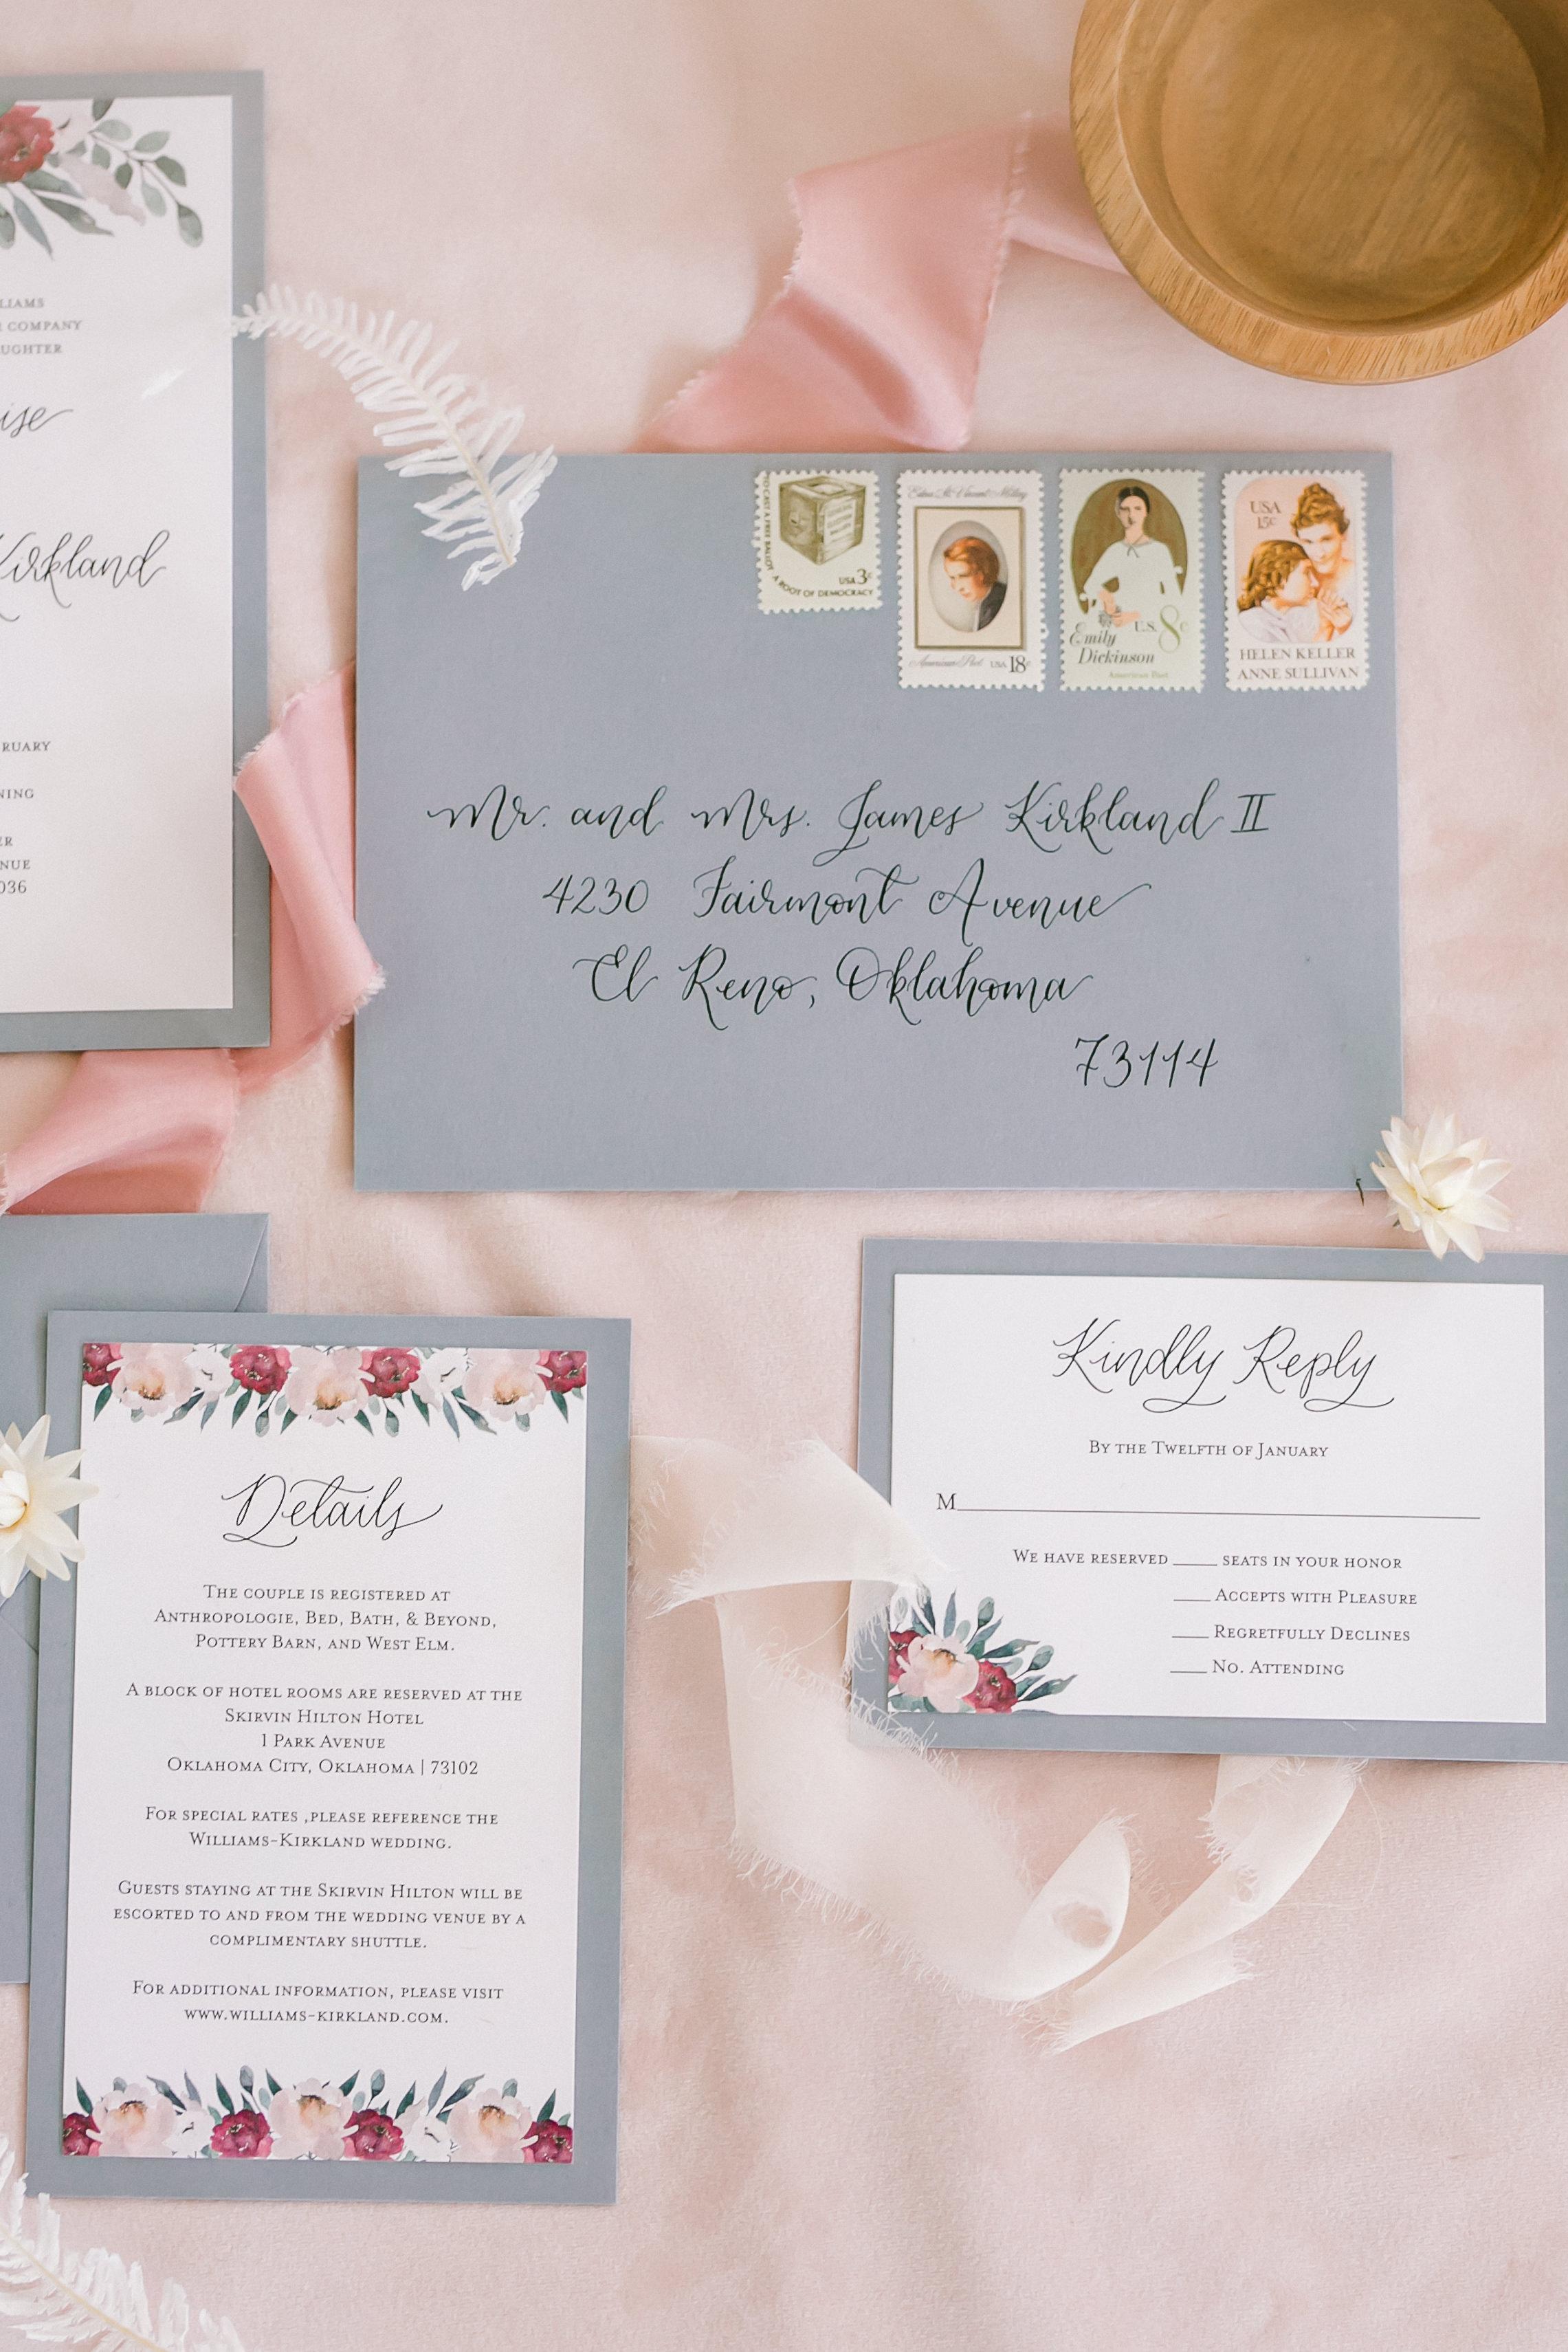 Festivities-Event-Center-Wedding-Oklahoma-City-Wedding-Photographer-Emily-Nicole-Photo-175.jpg